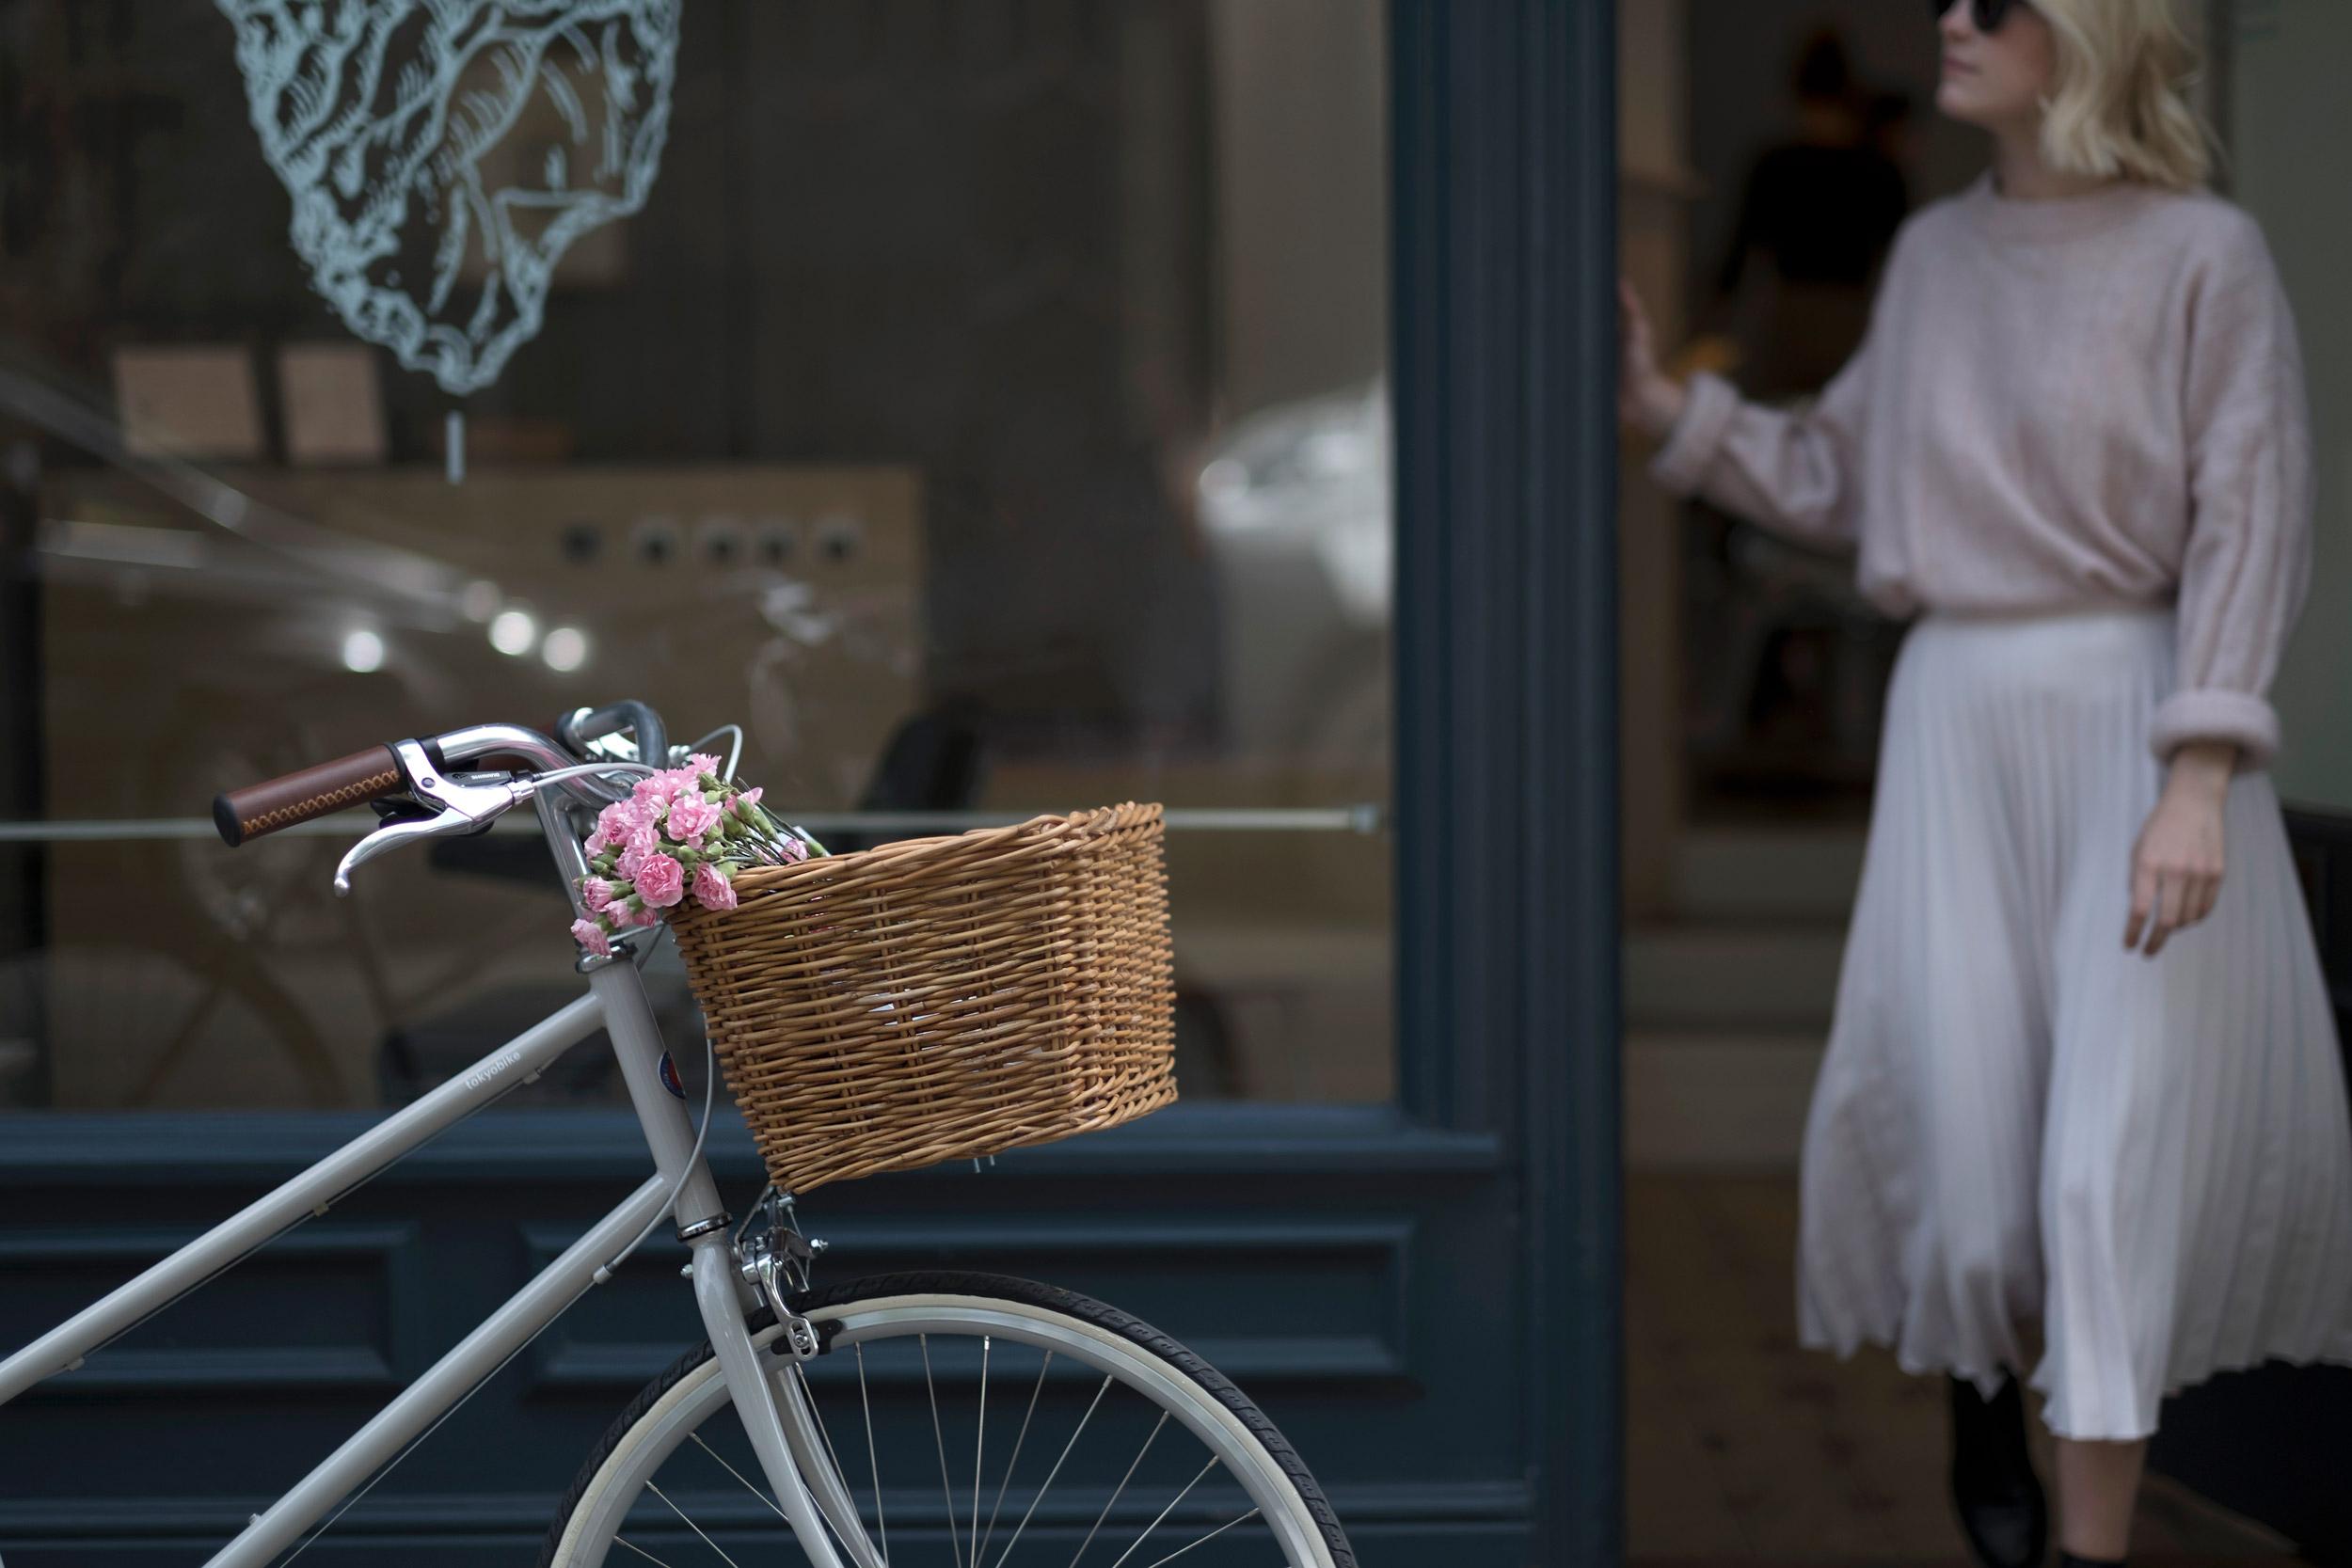 tokyobike-simple-minimal-norwich-fiona-burrage-photographer-flowers.jpg